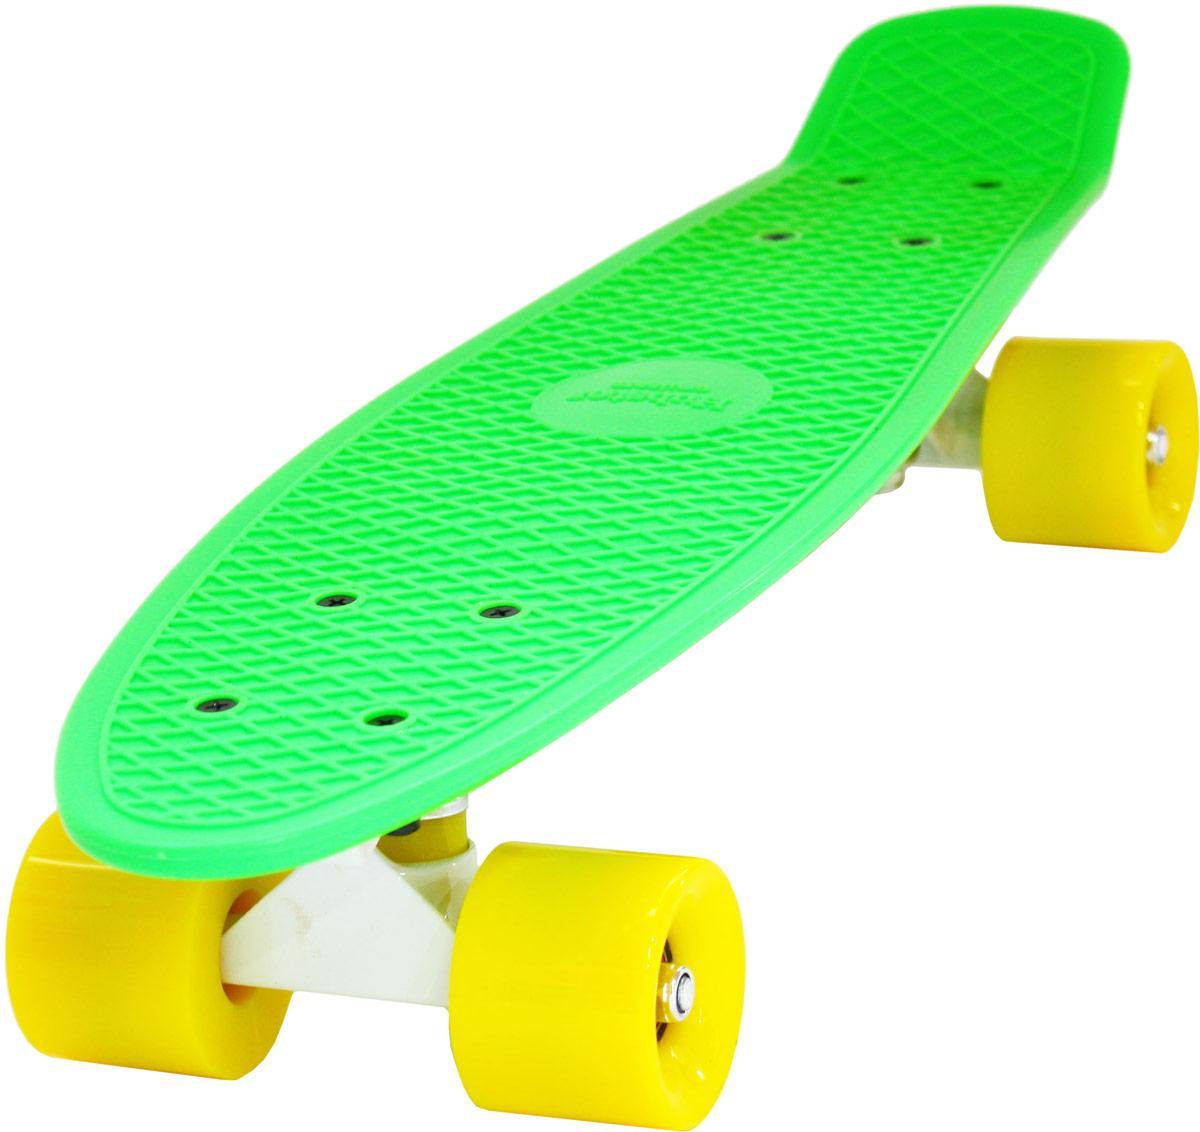 "Пенни борд Hubster ""Cruiser"", цвет: зеленый, желтый, дека 22"""